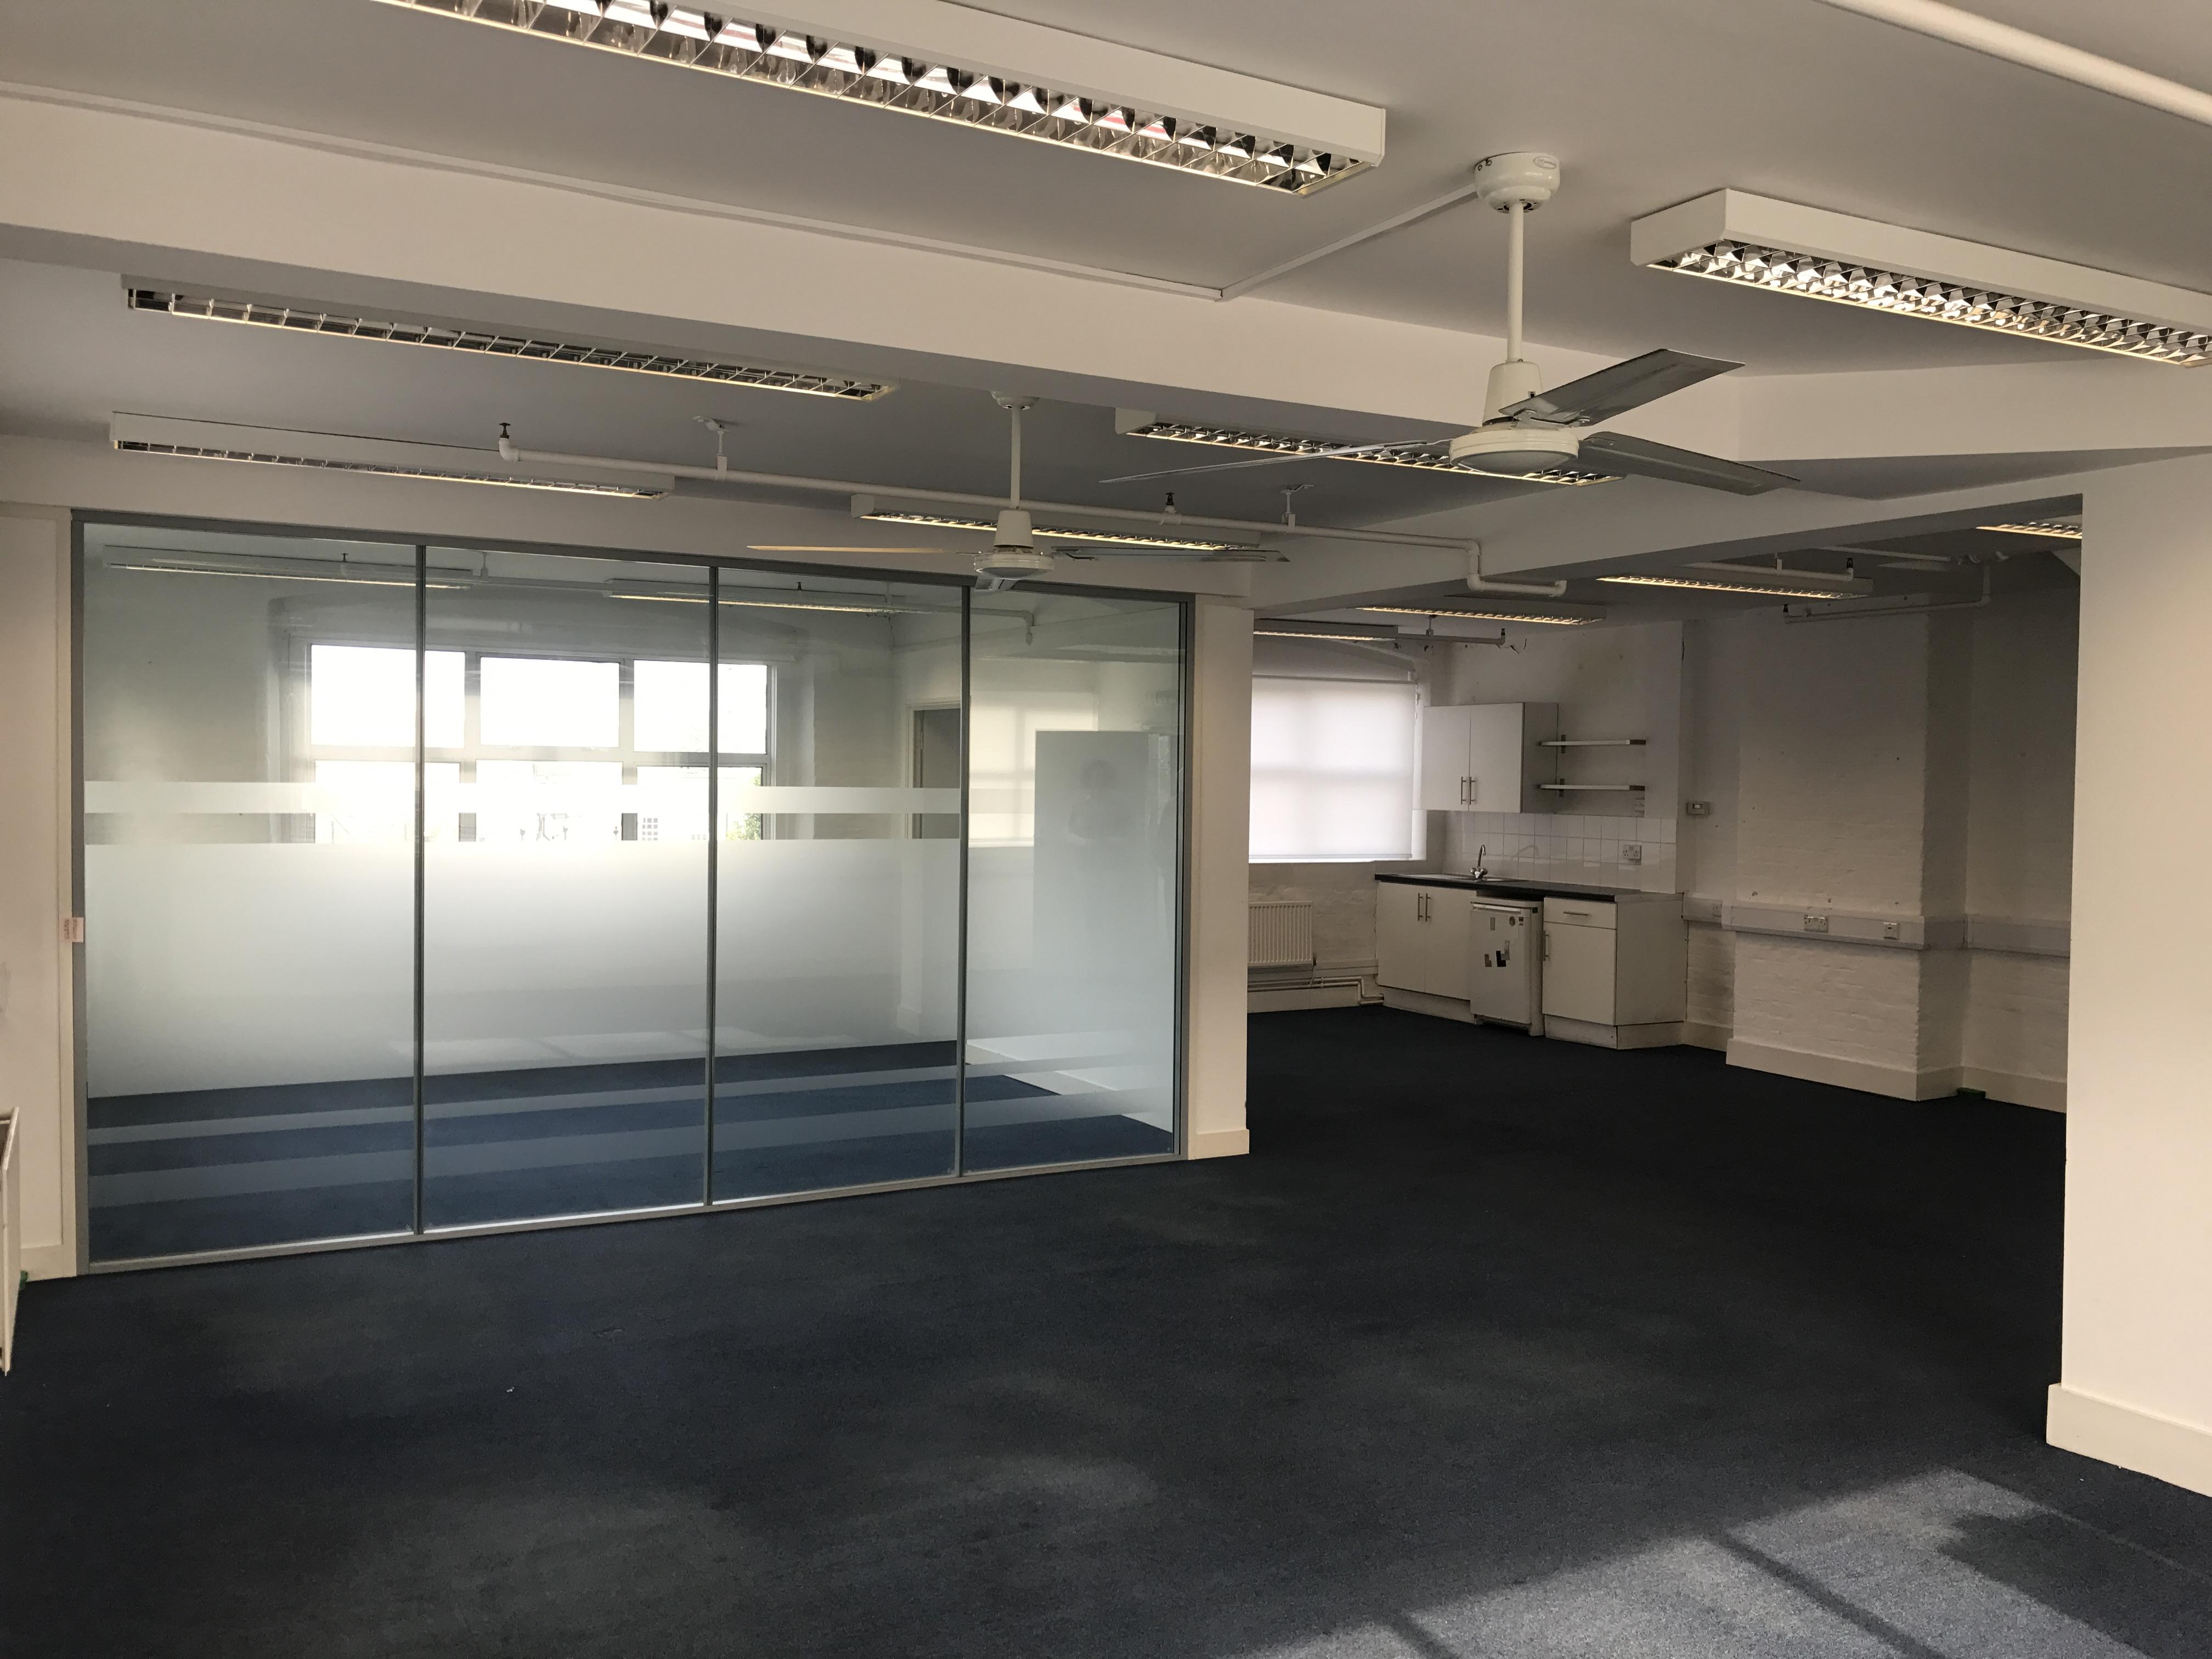 LYMEHOUSE STUDIOS, GEORGIANA STREET, LONDON, NW1 1,585 SQ F OFFICE TO LET